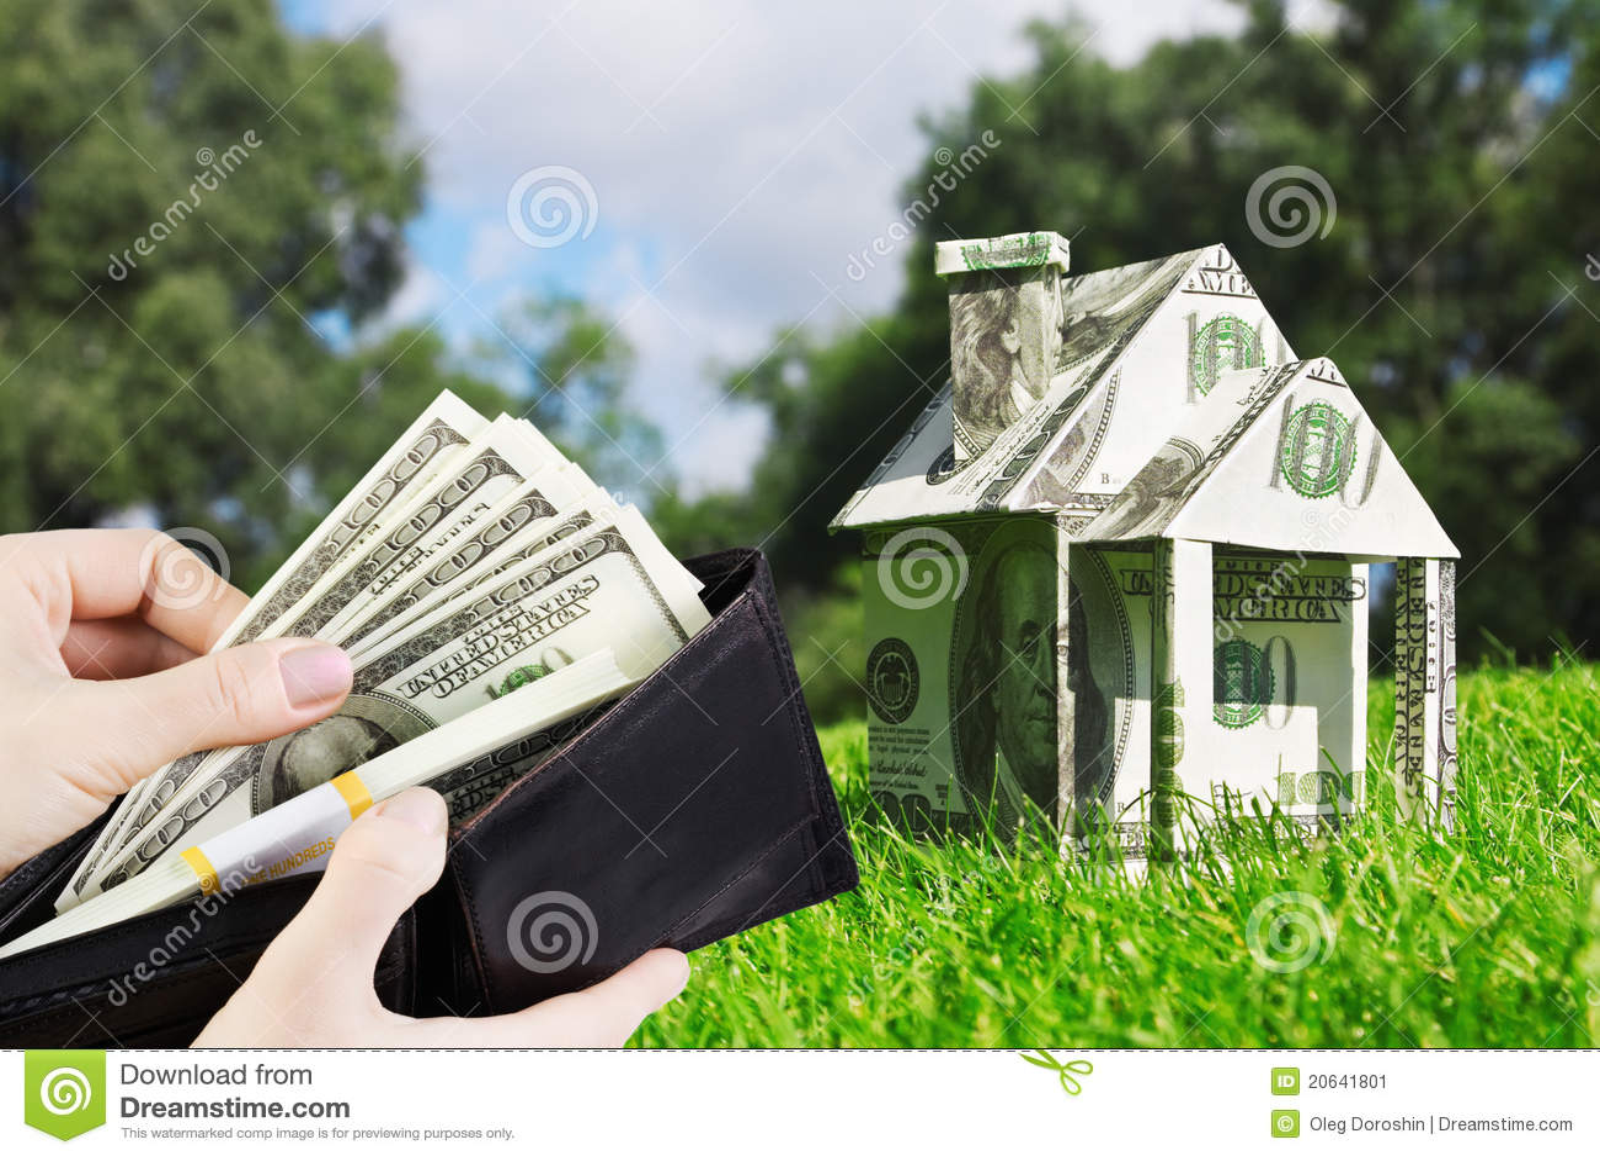 залог земельного участка займ